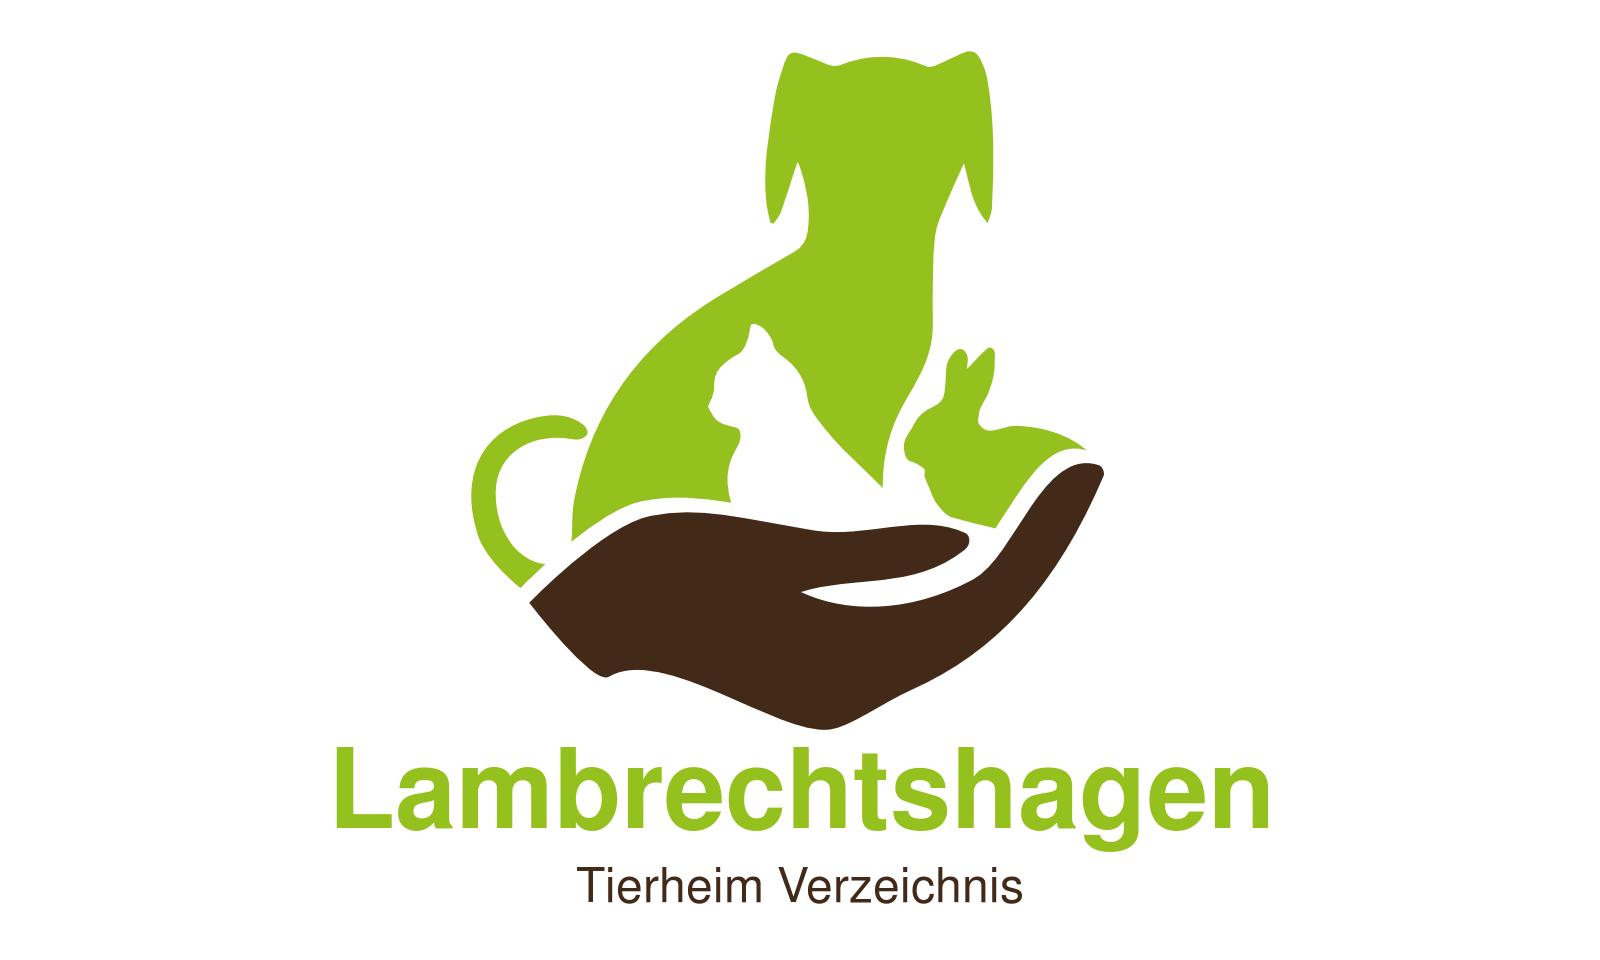 Tierheim Lambrechtshagen